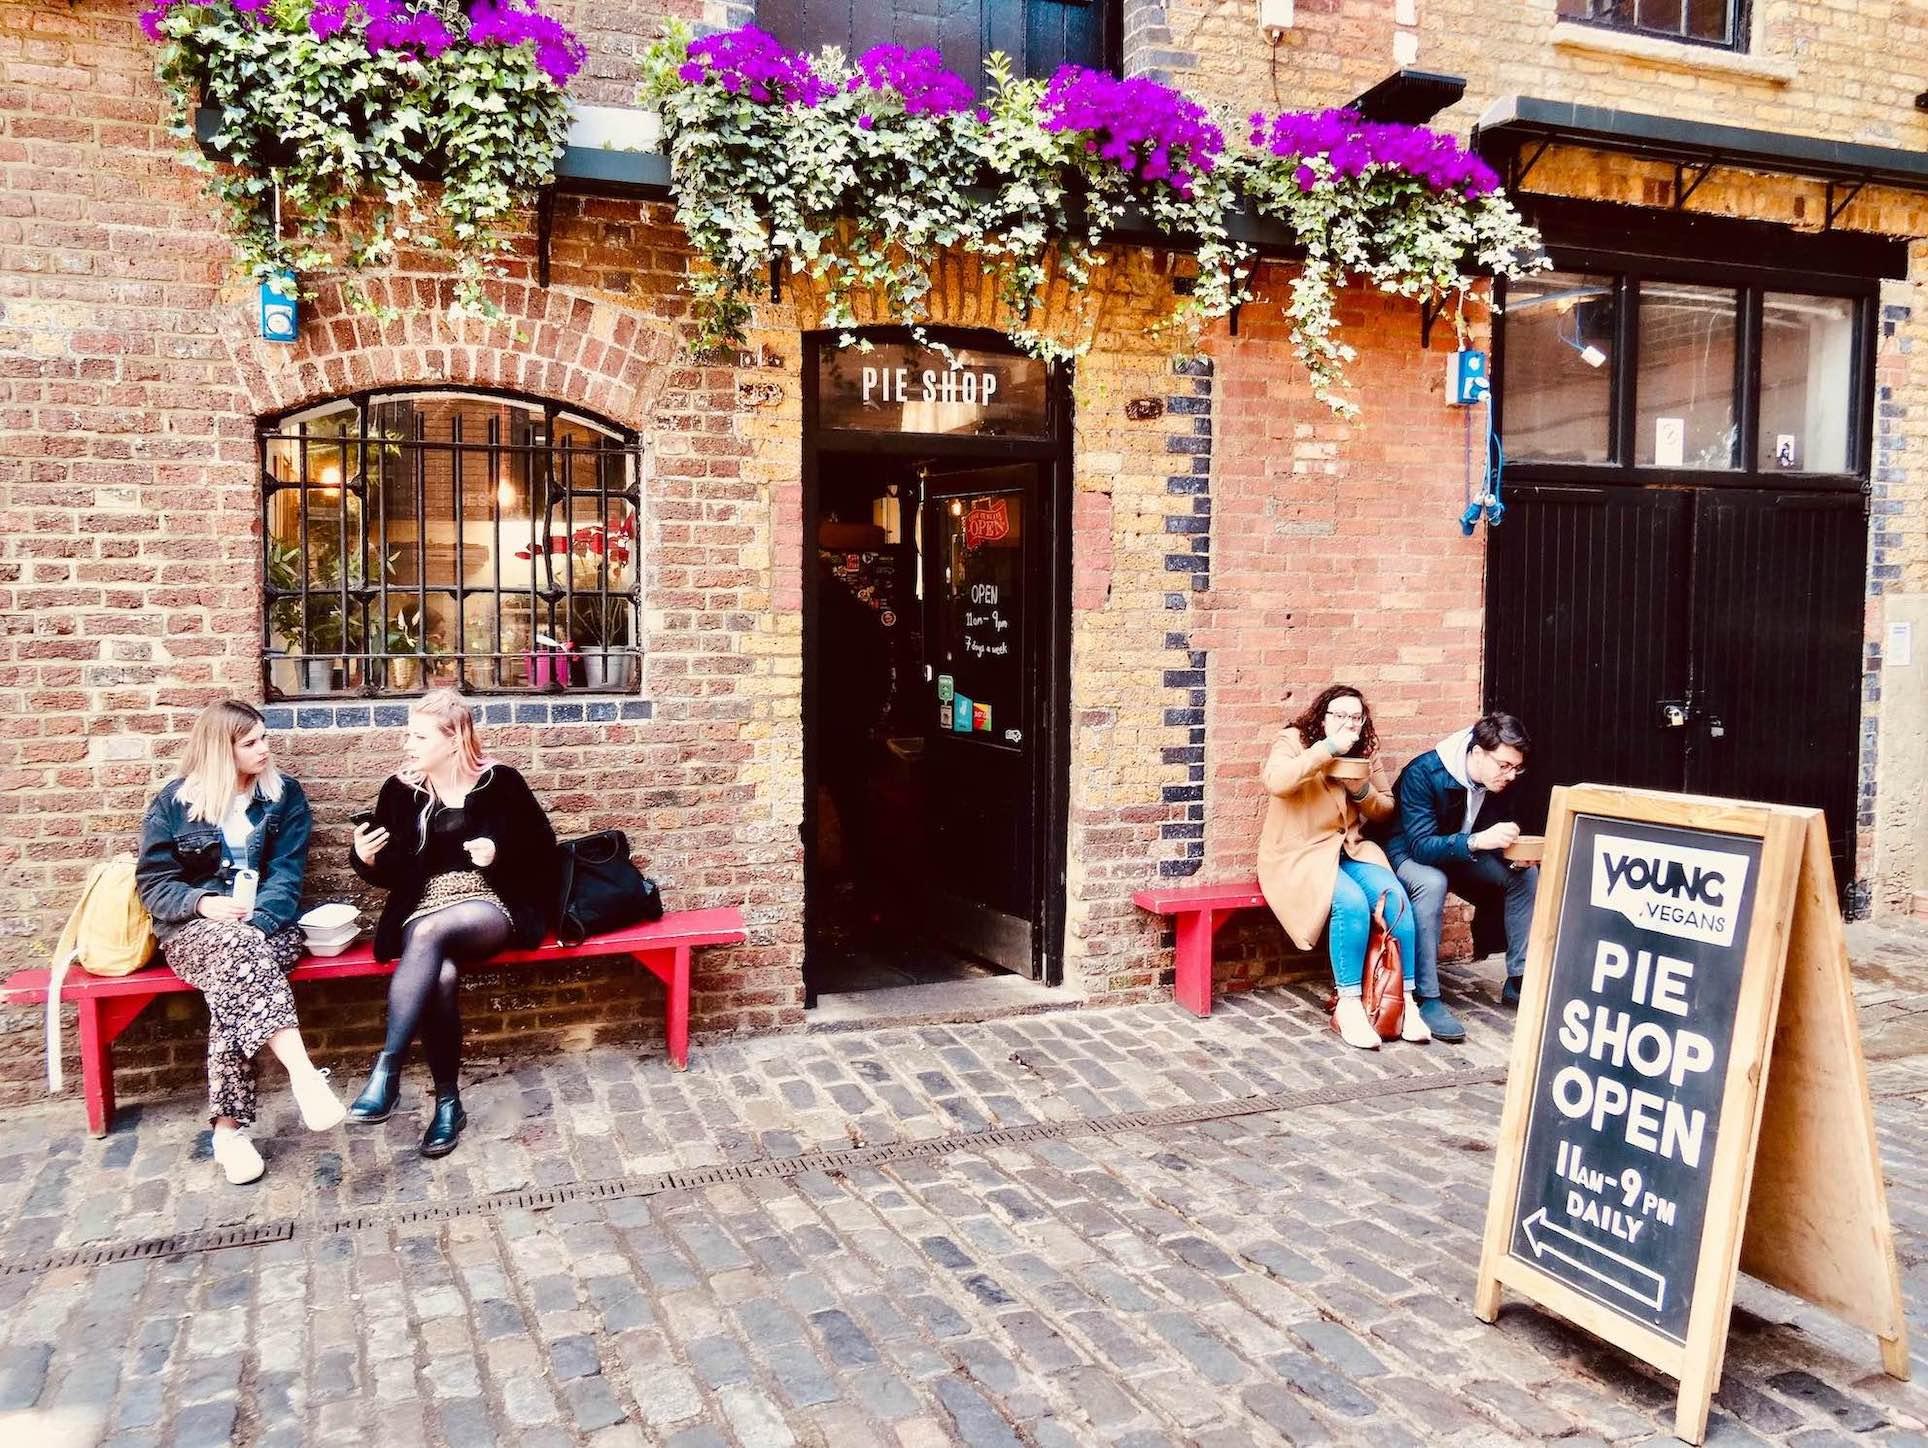 Young Vegans Pie Shop Camden Town.